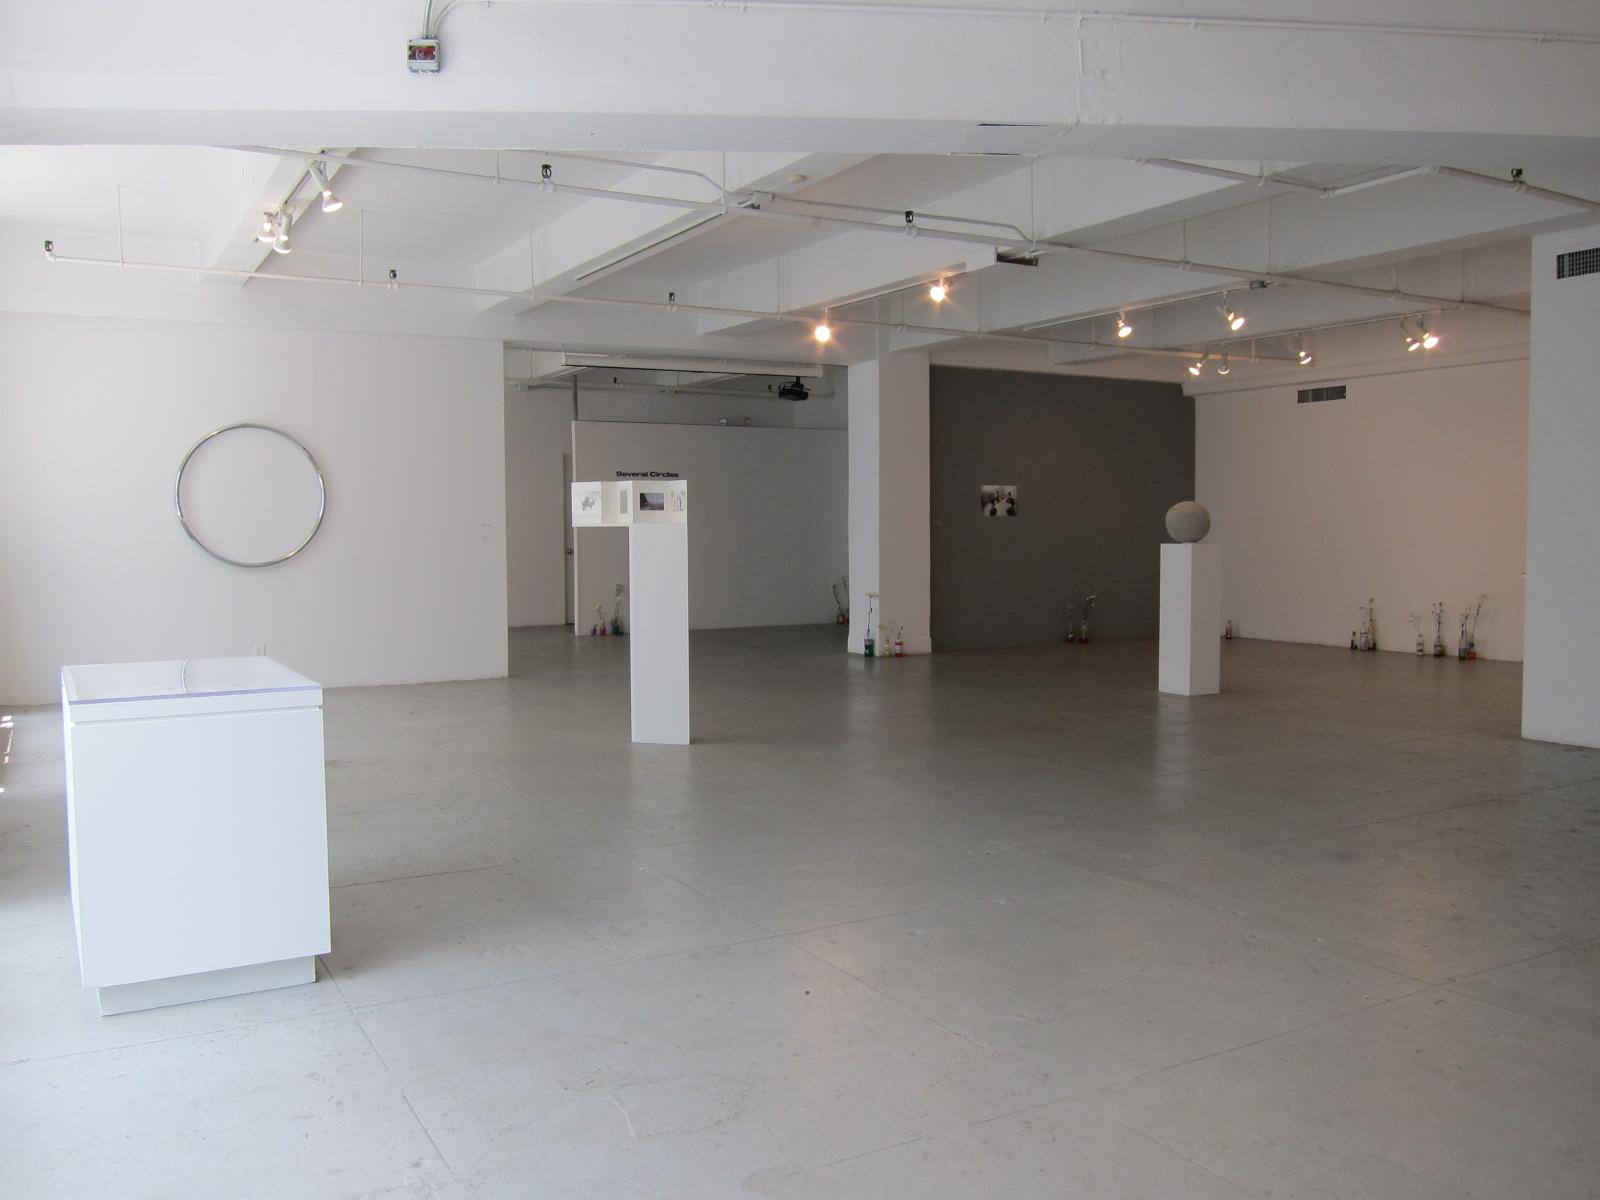 Installation view of Several Circles